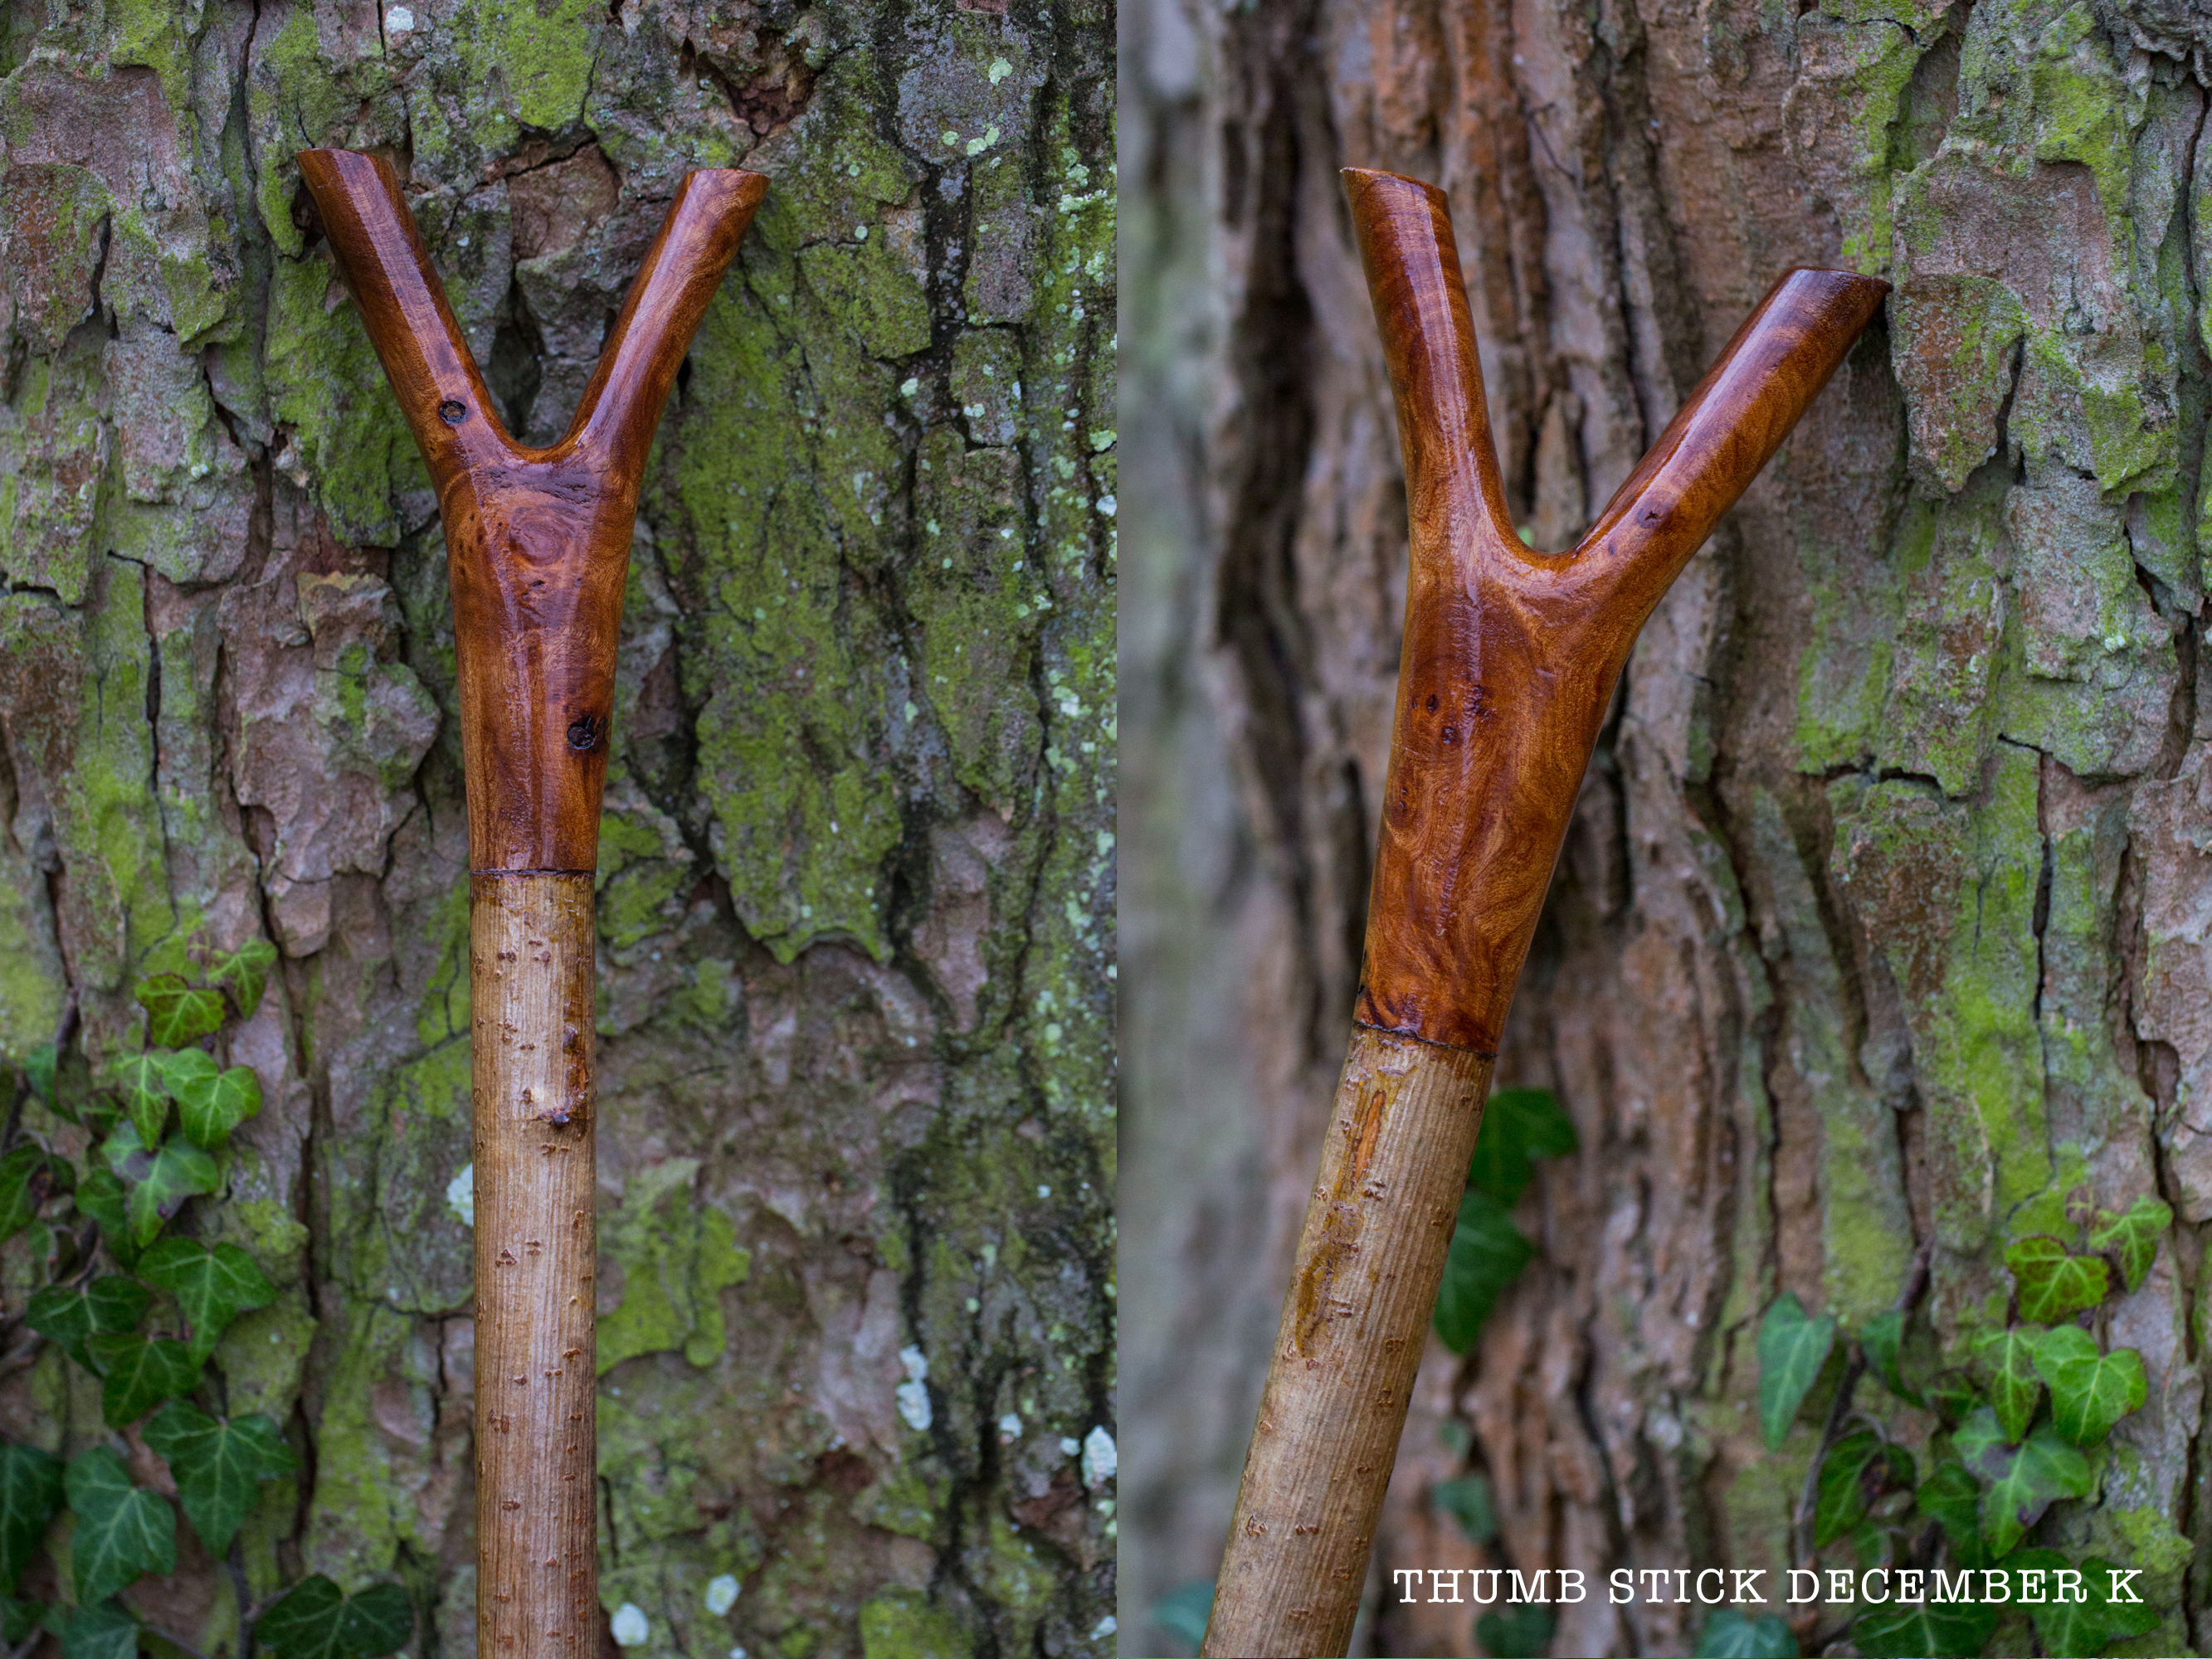 AAA Thumb Stick K